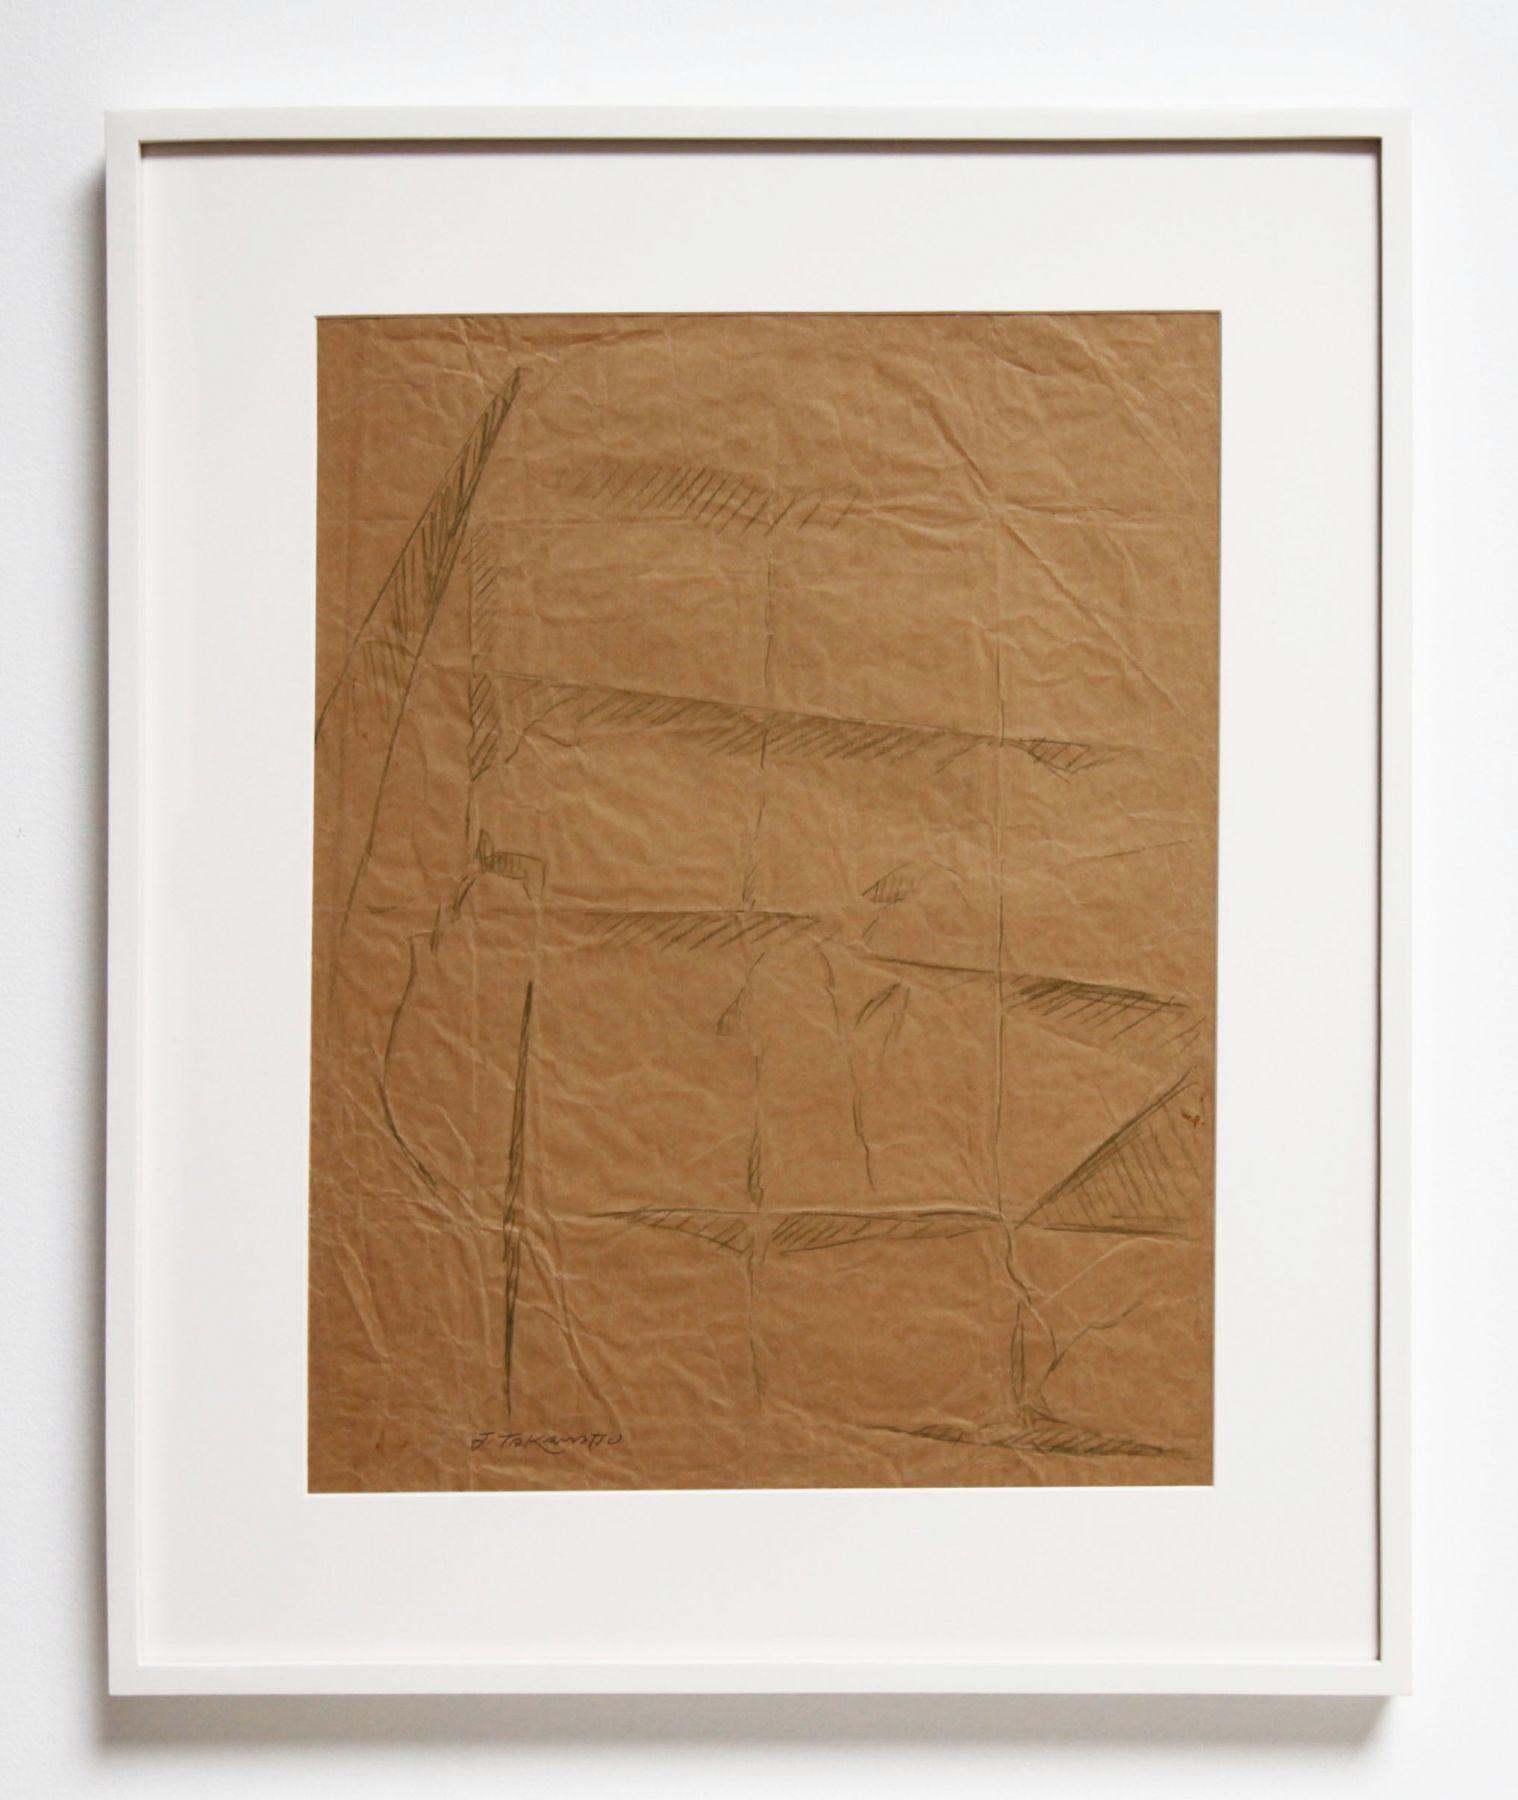 Jiro Takamatsu Wrinkles, 1973-75